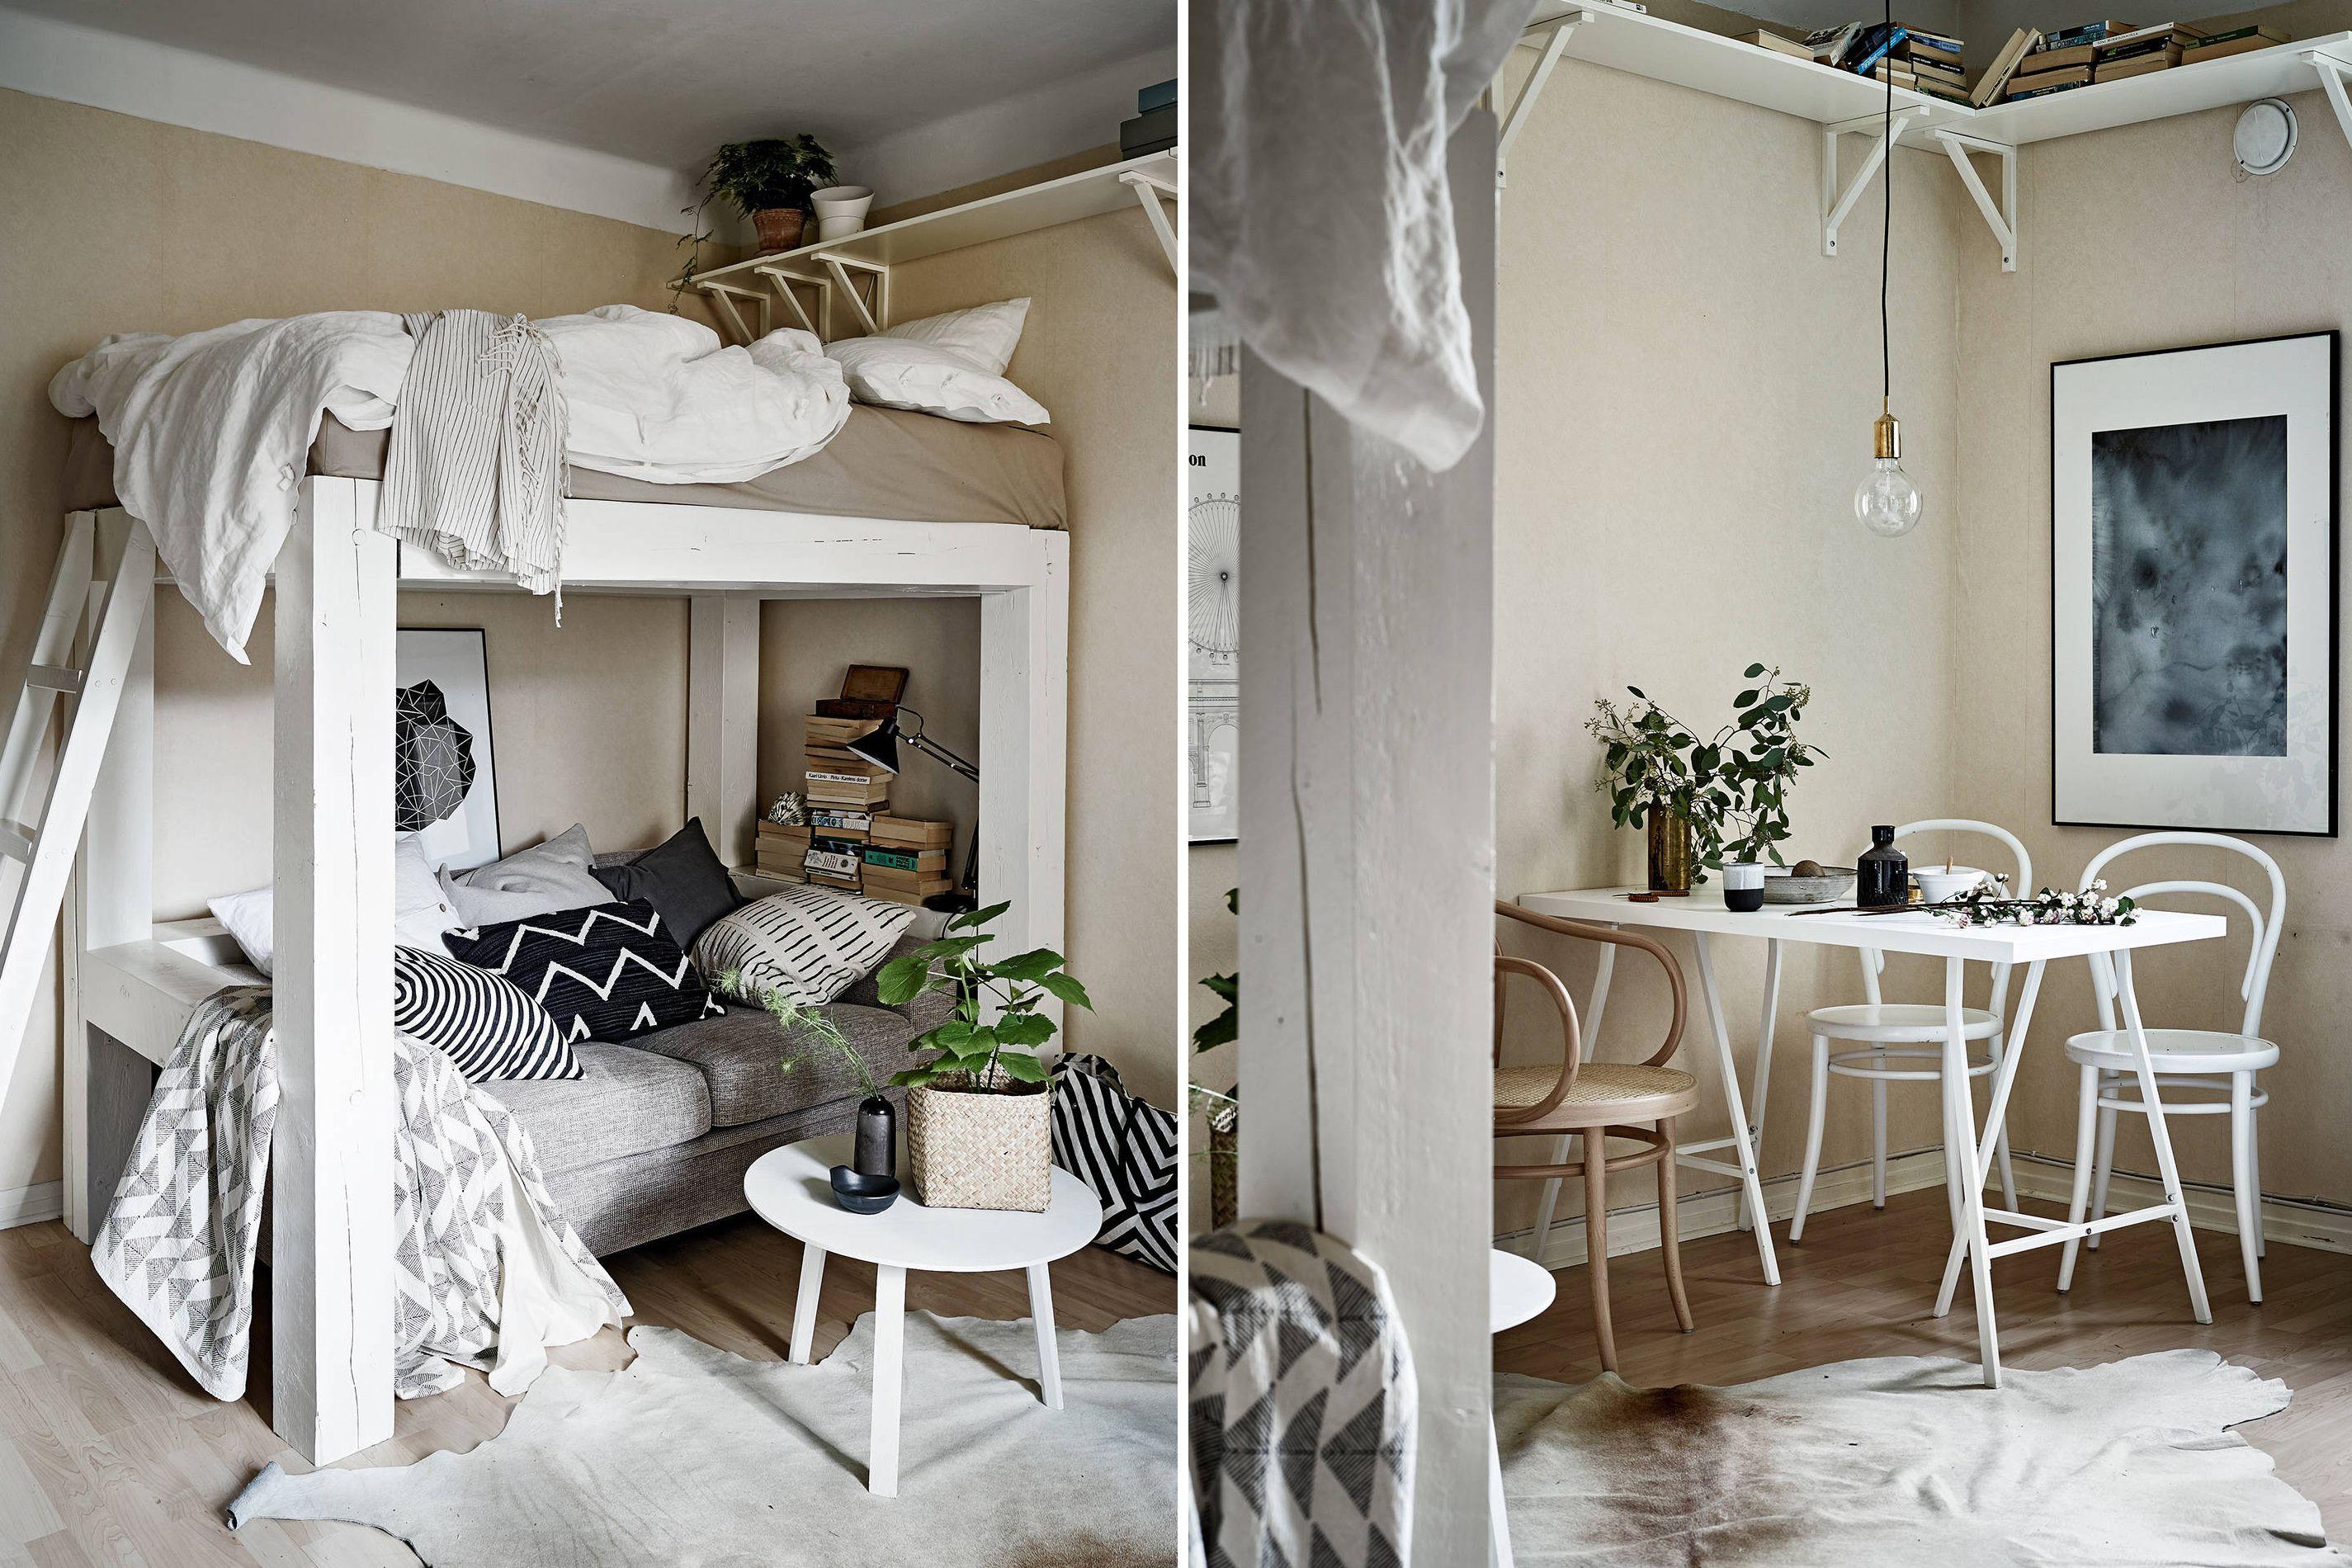 Prettify clunky loft bed